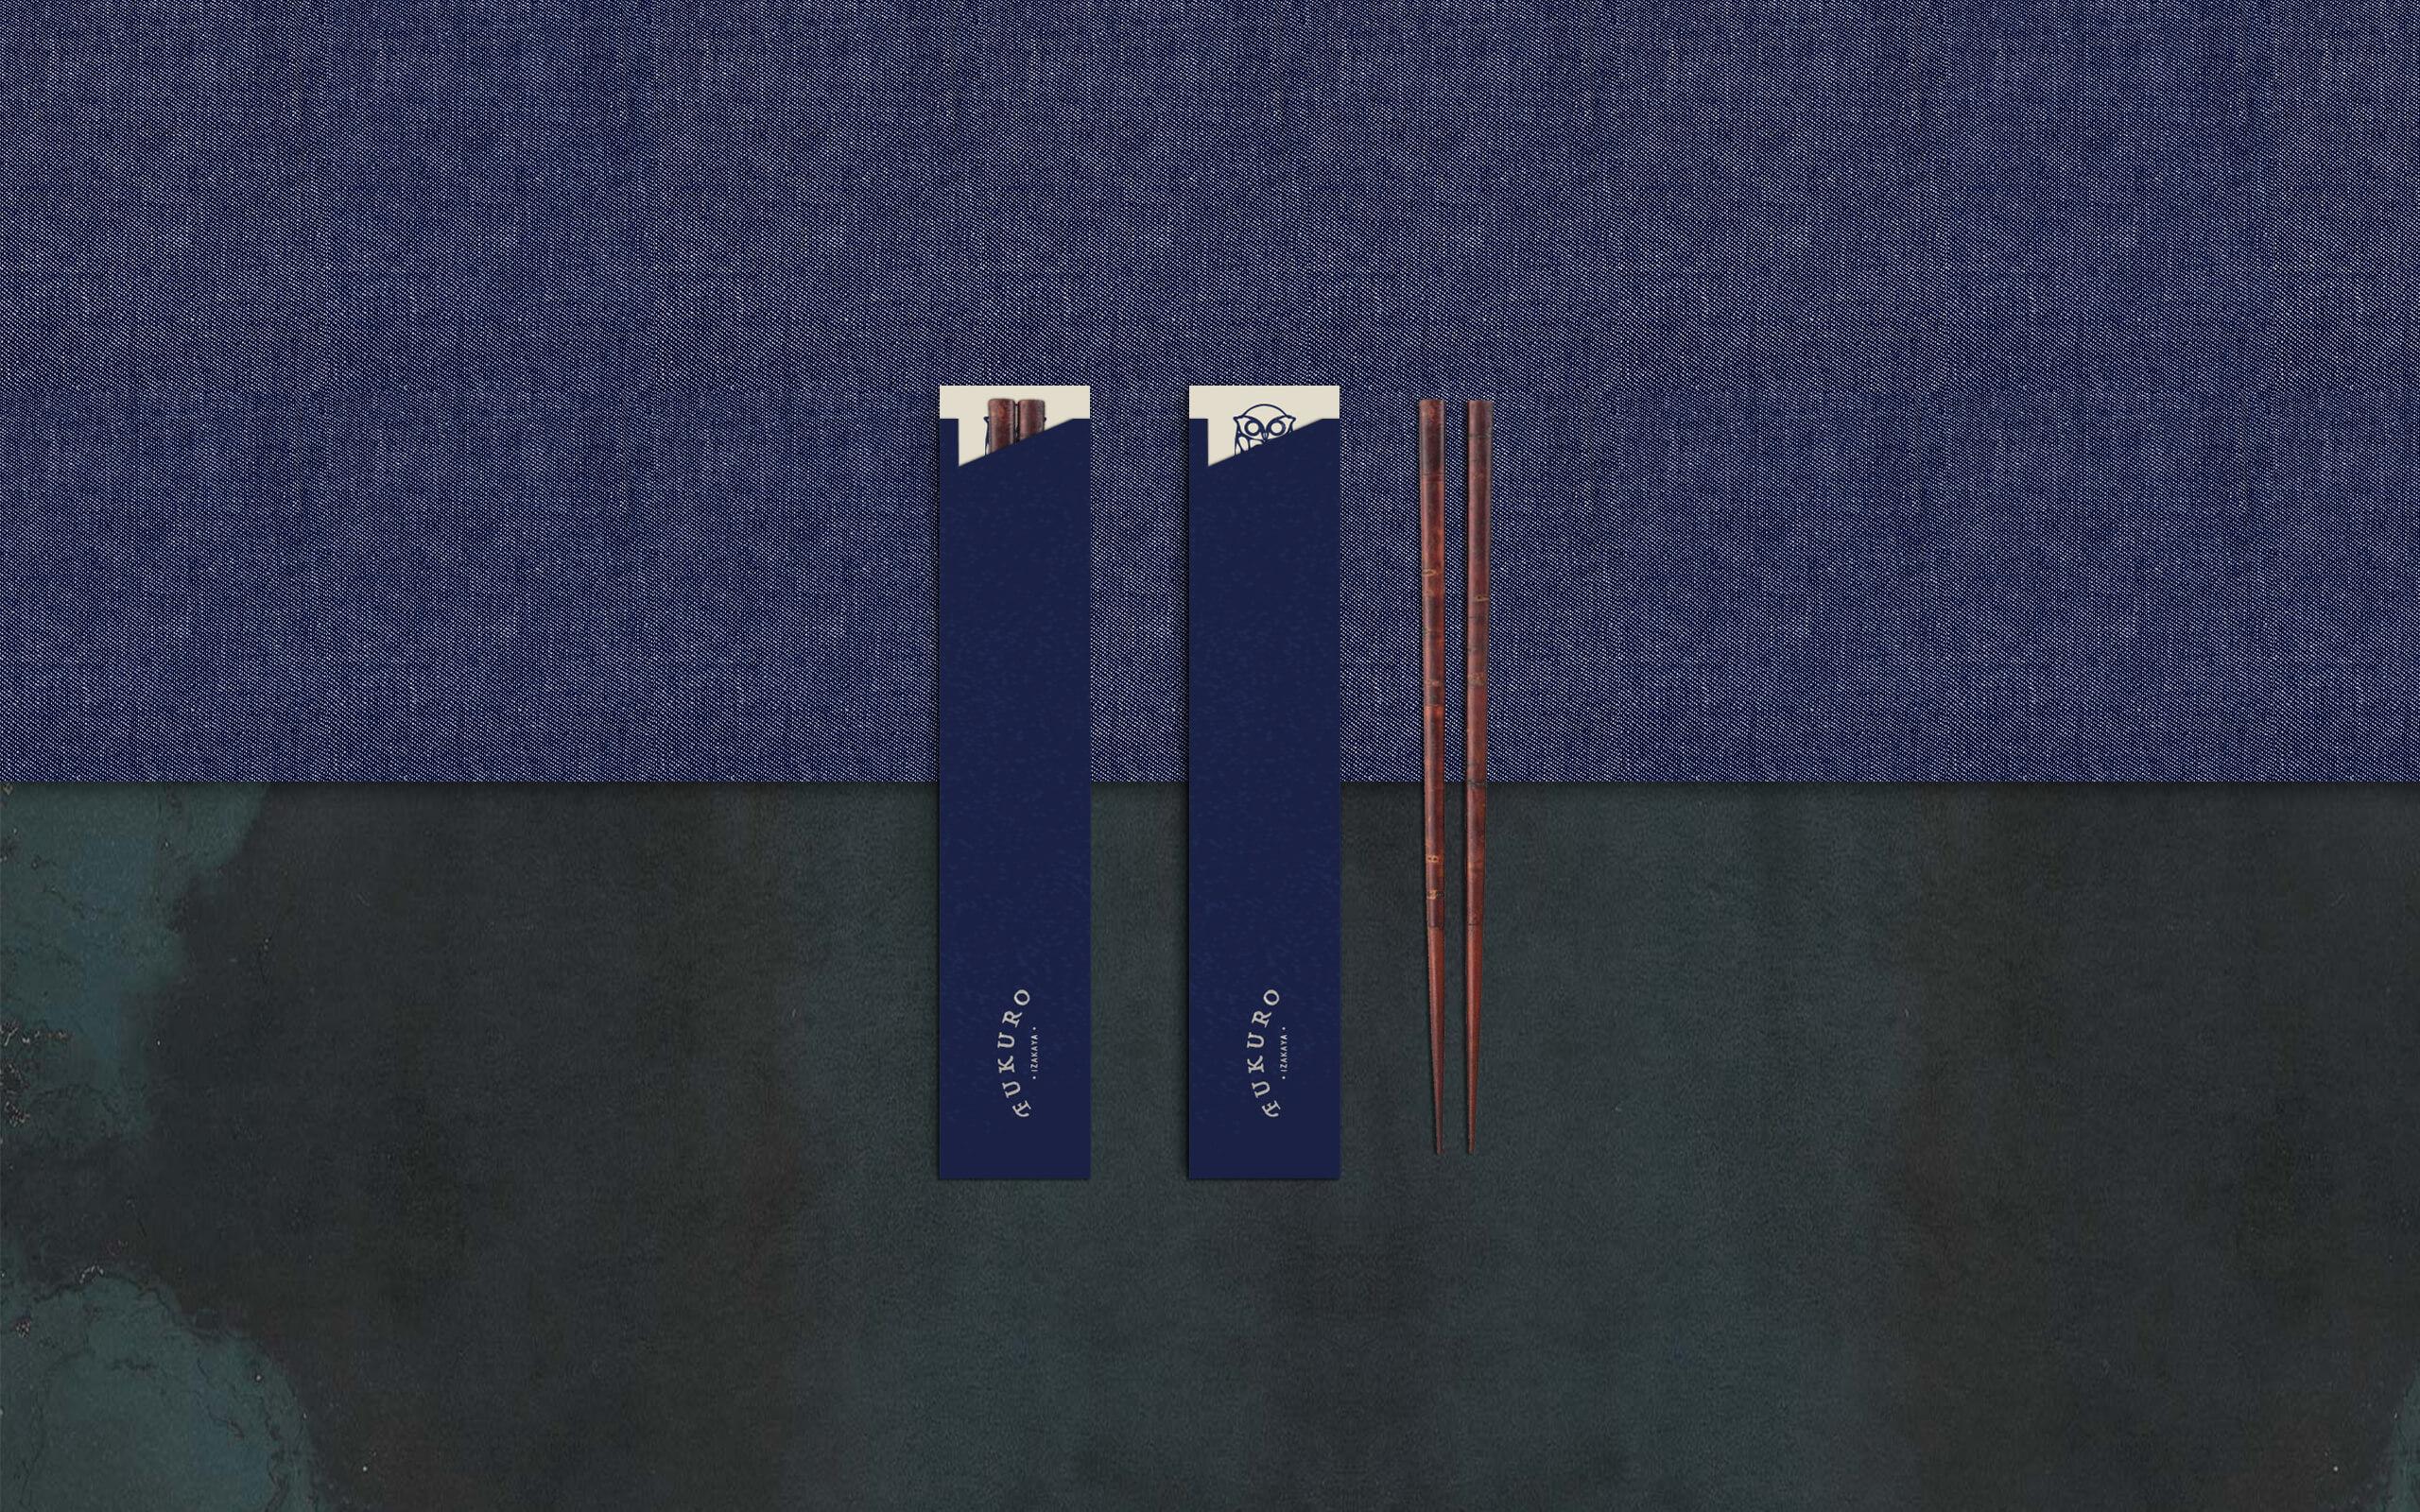 Fukuro chopstick